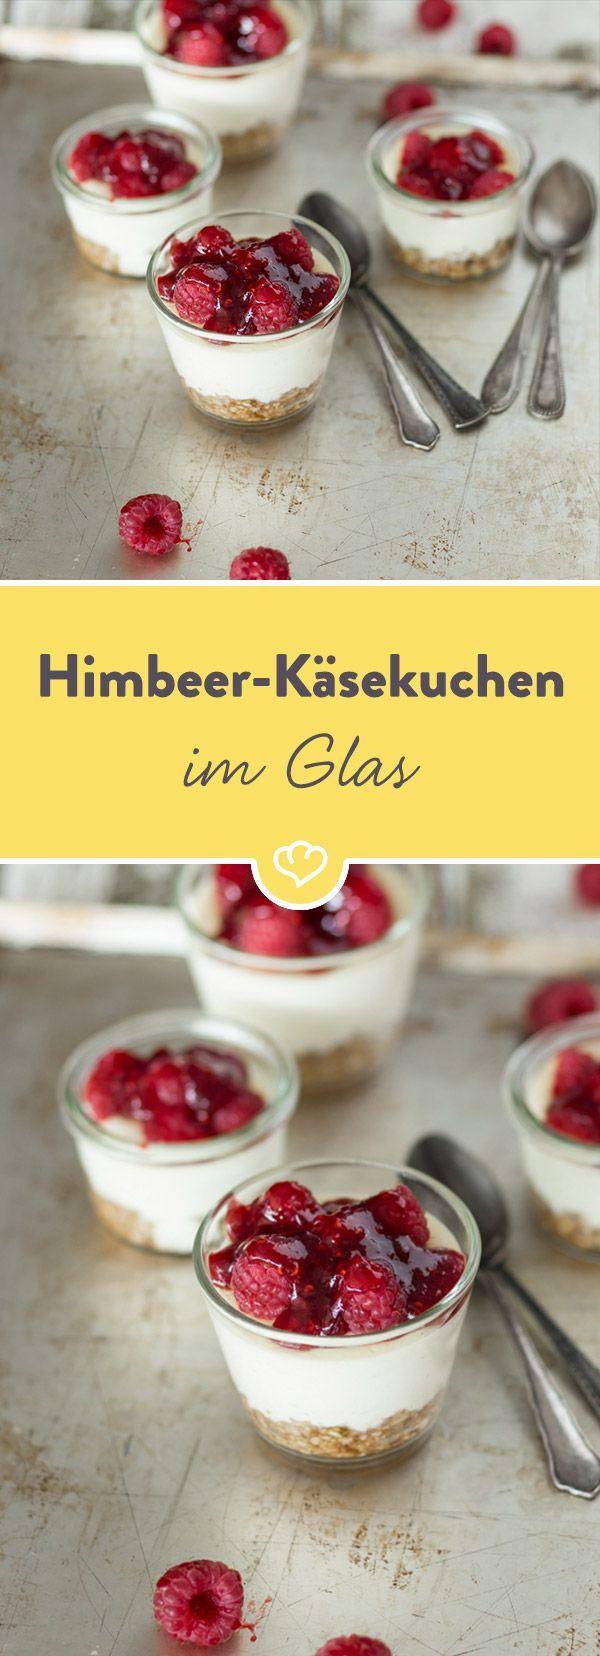 Himbeer-Käsekuchen im Glas #simplecheesecakerecipe